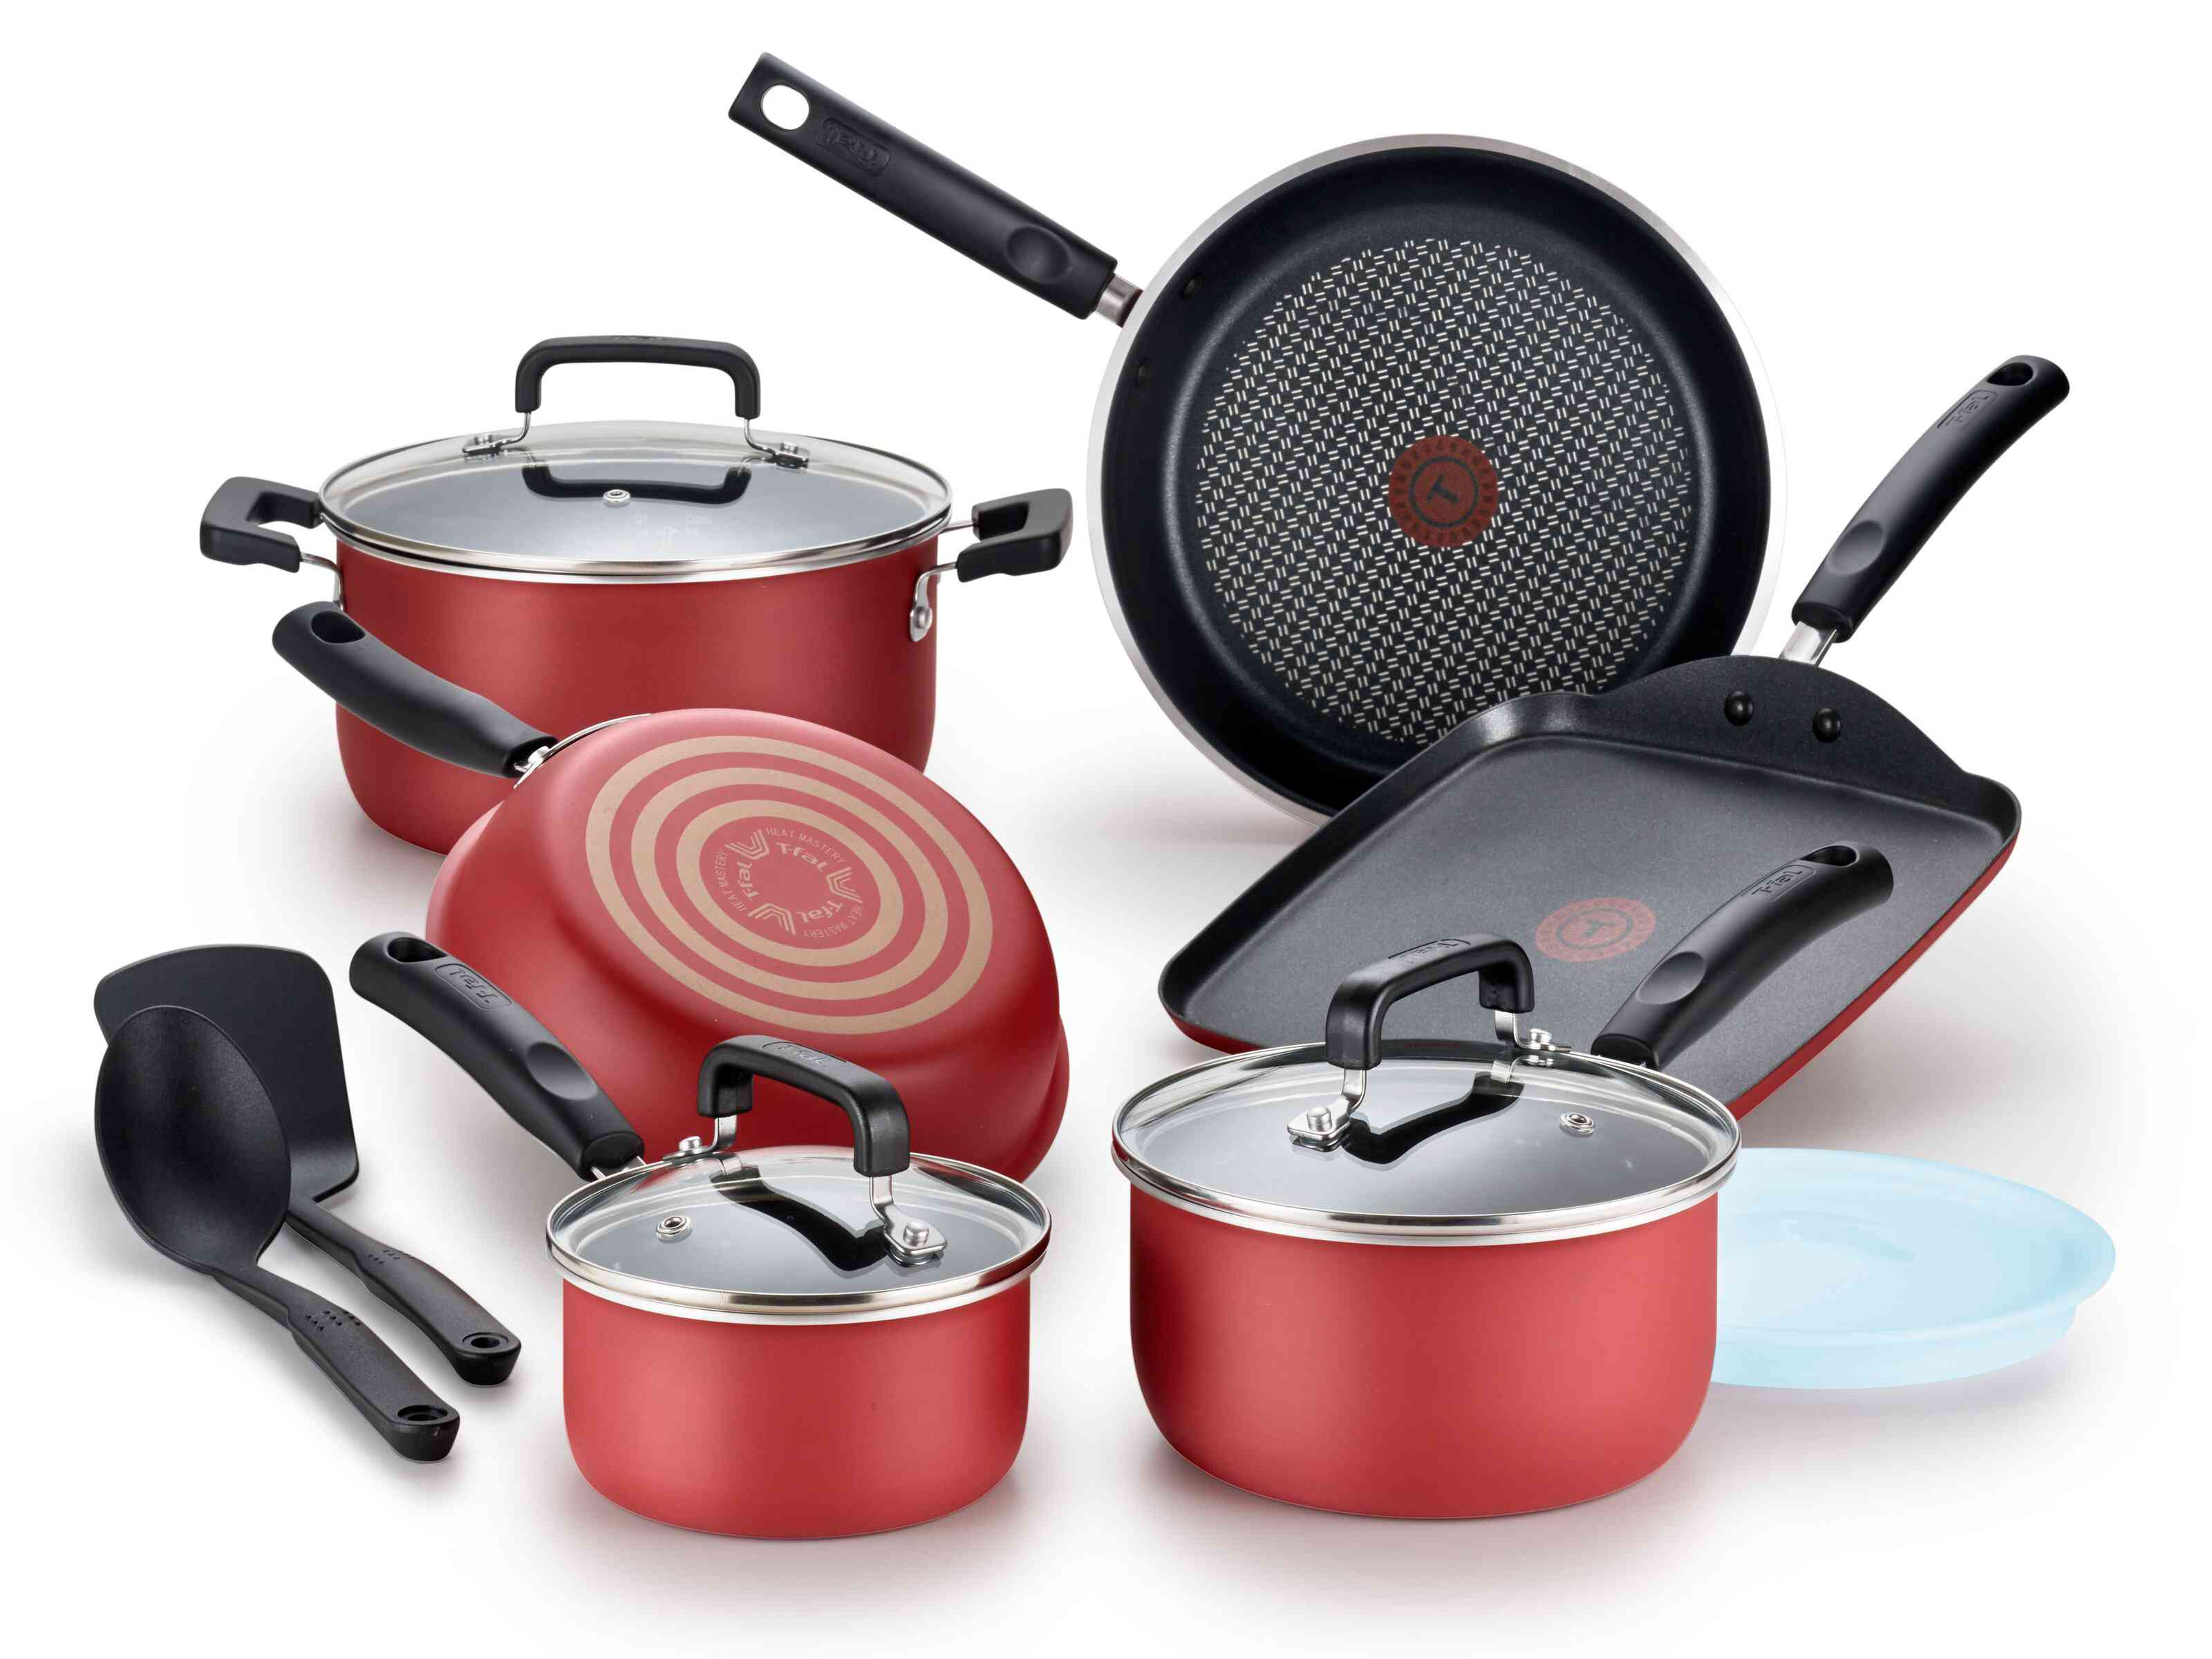 T-fal Signature 12-Piece Nonstick Cookware Set